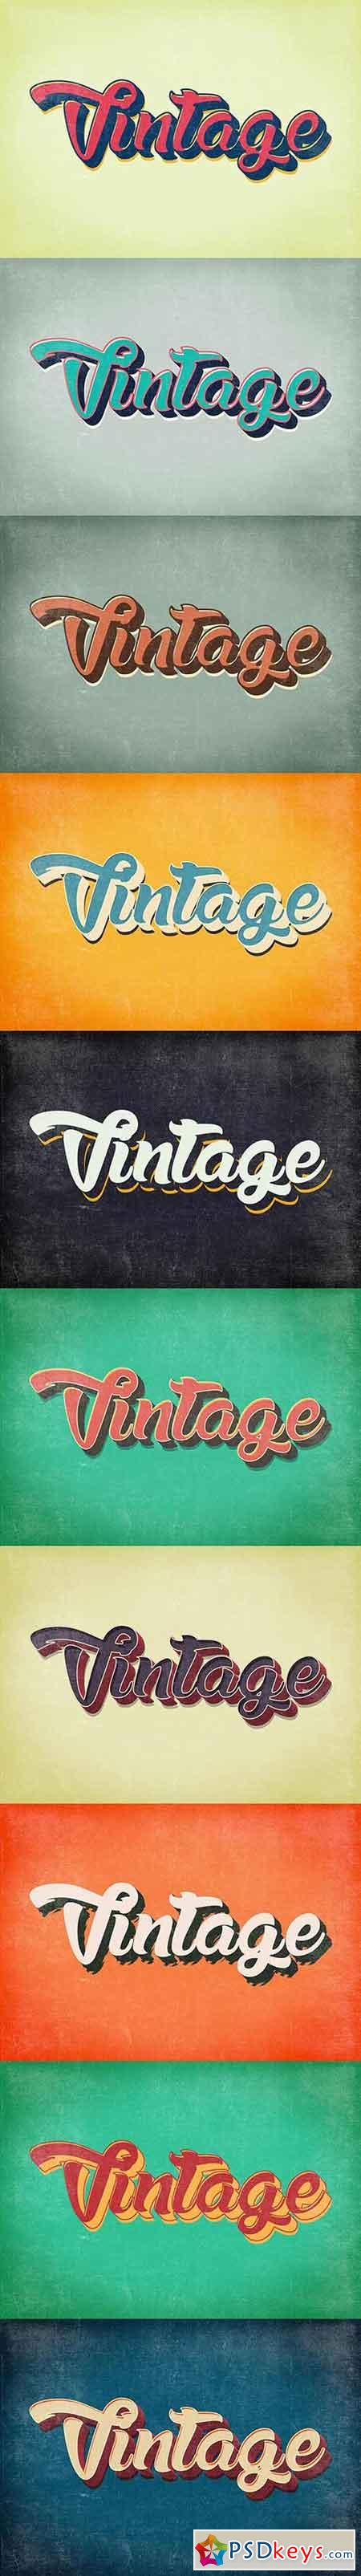 Vintage & Retro Text Styles